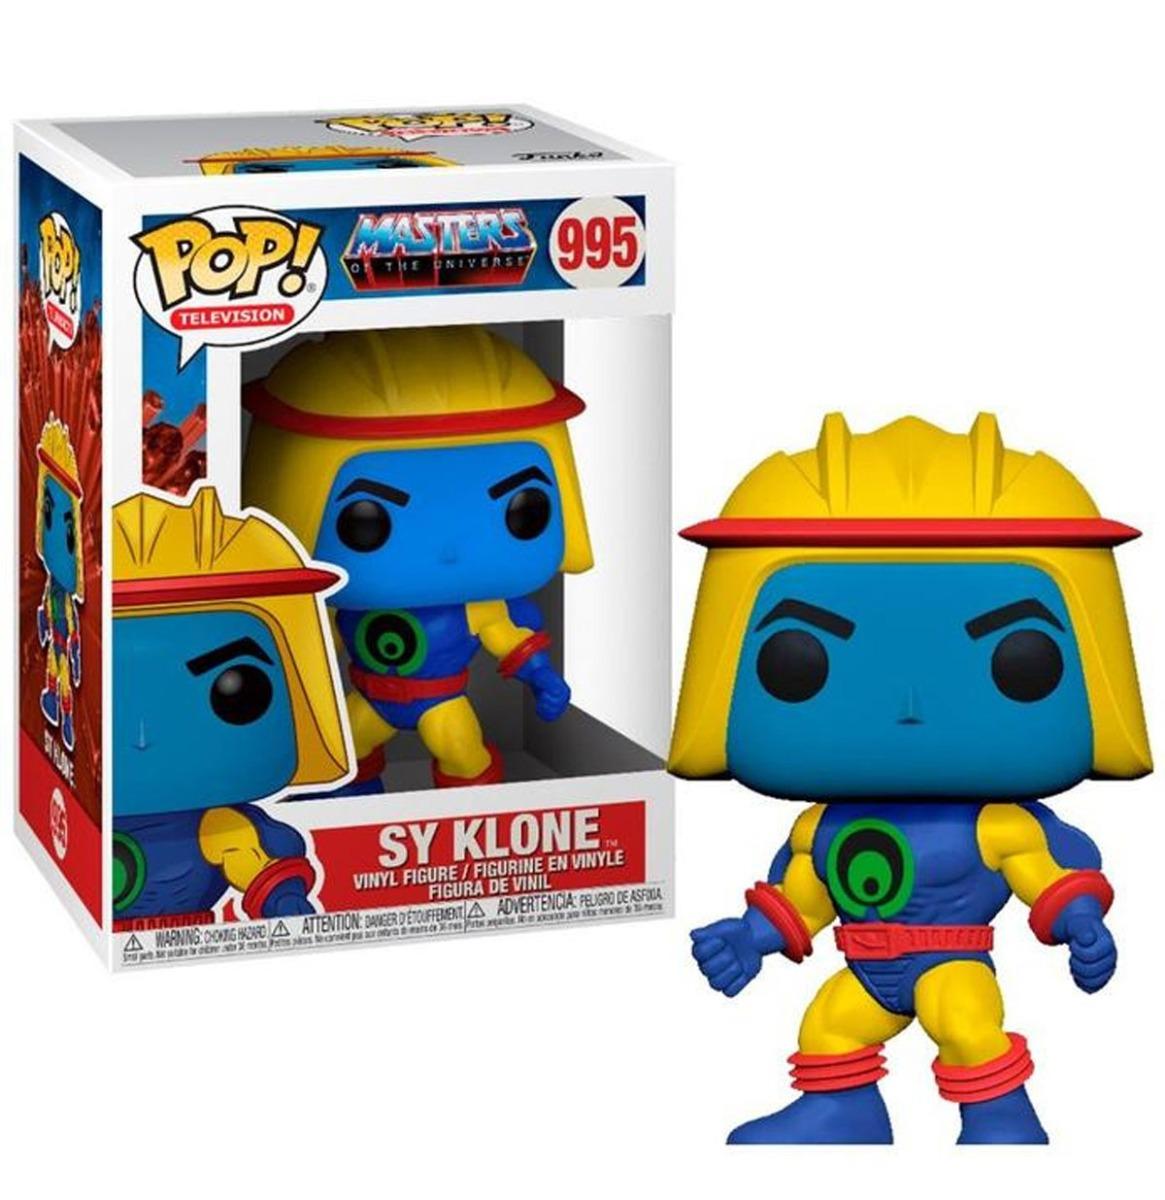 Funko Pop! Cartoons - Masters of the Universe - Sy-Klone